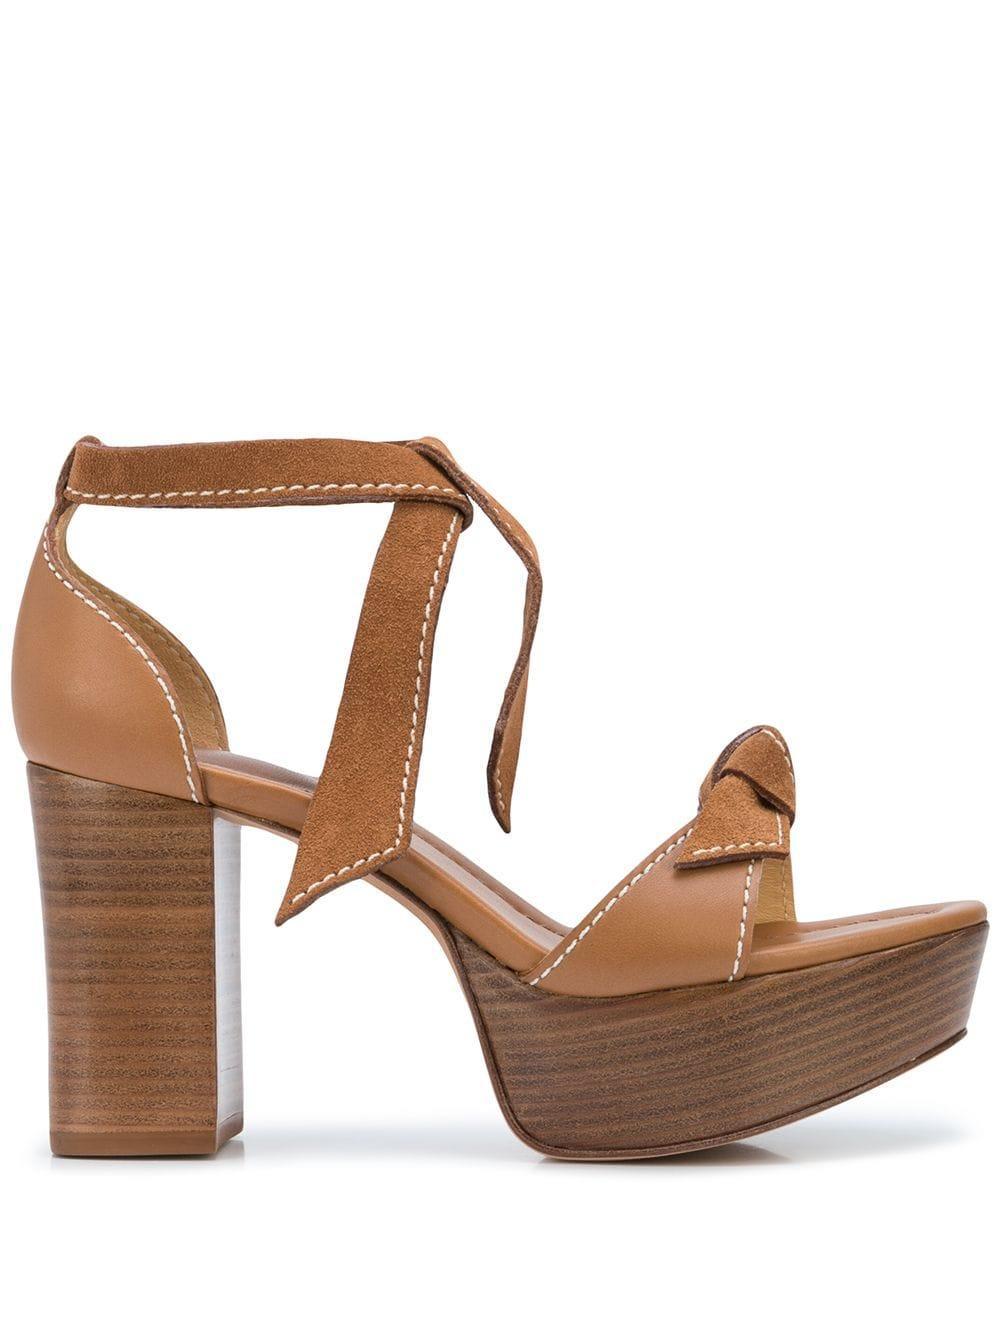 Clarita 85mm Platform Sandal